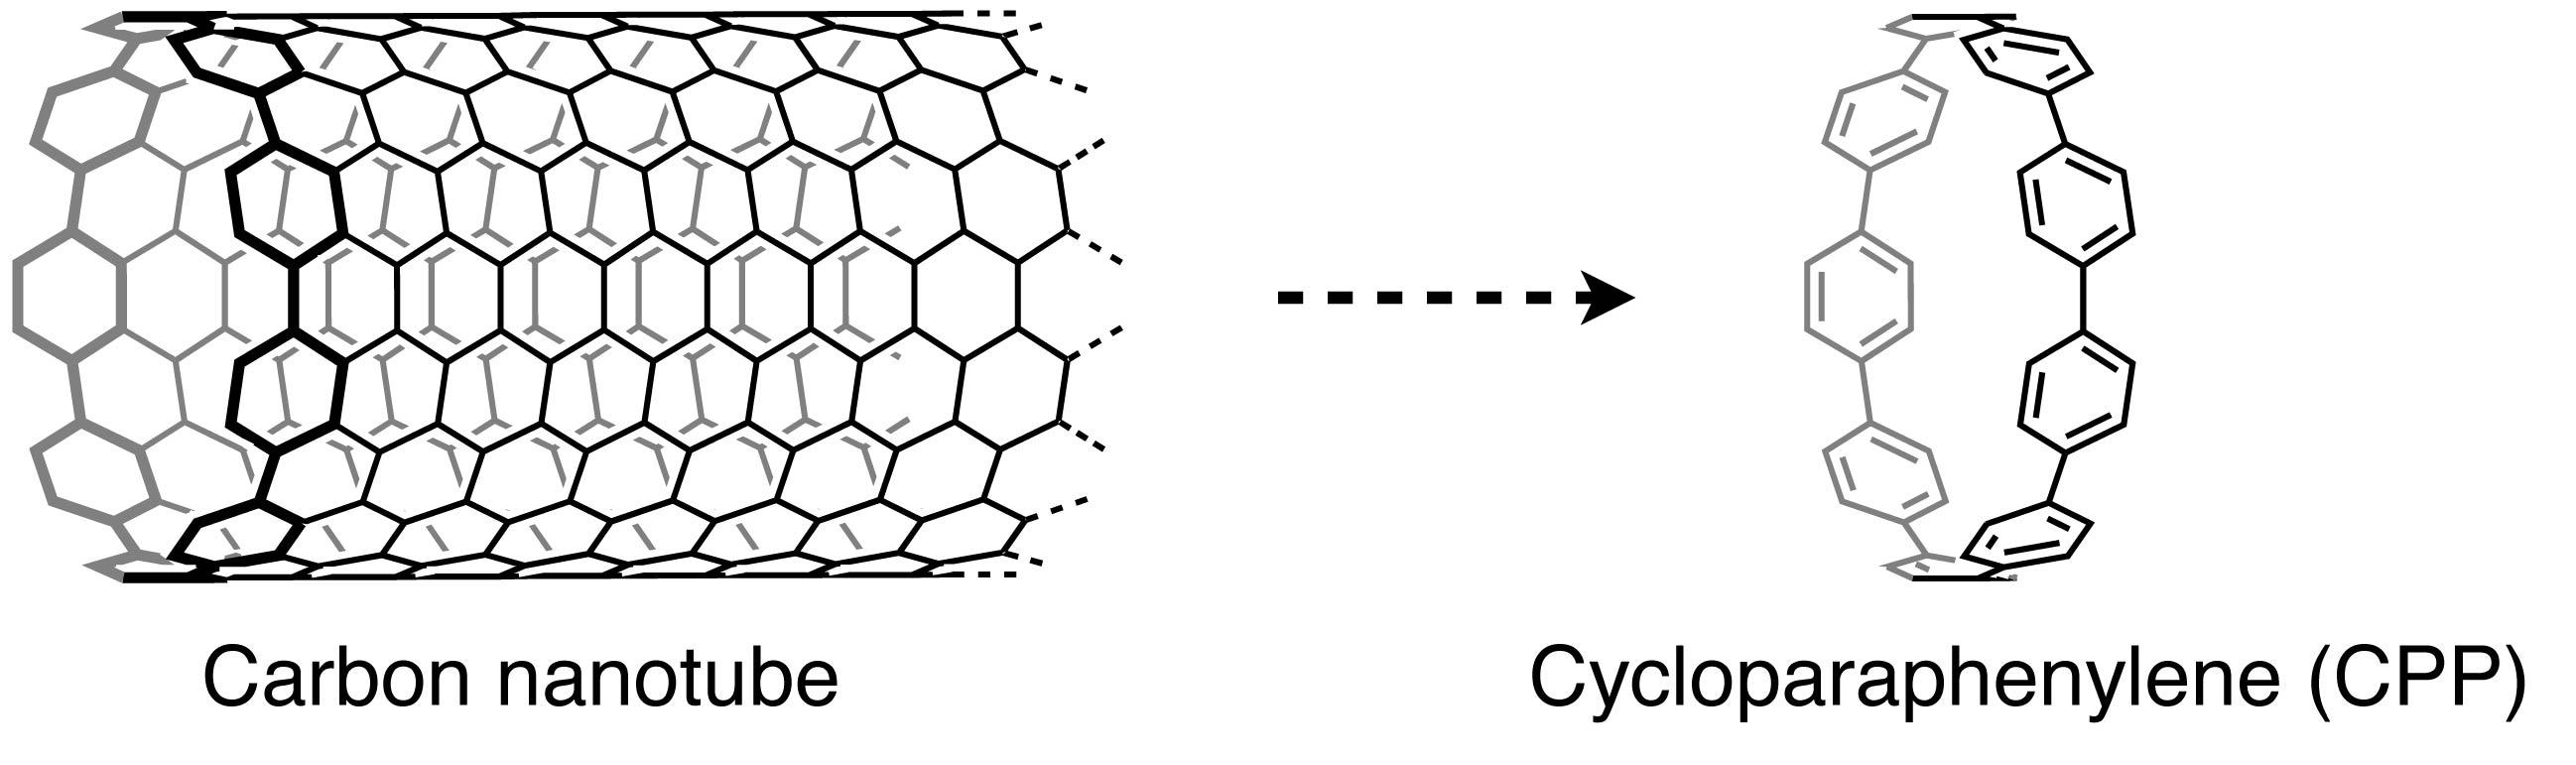 CPPCr_Figure2.jpg